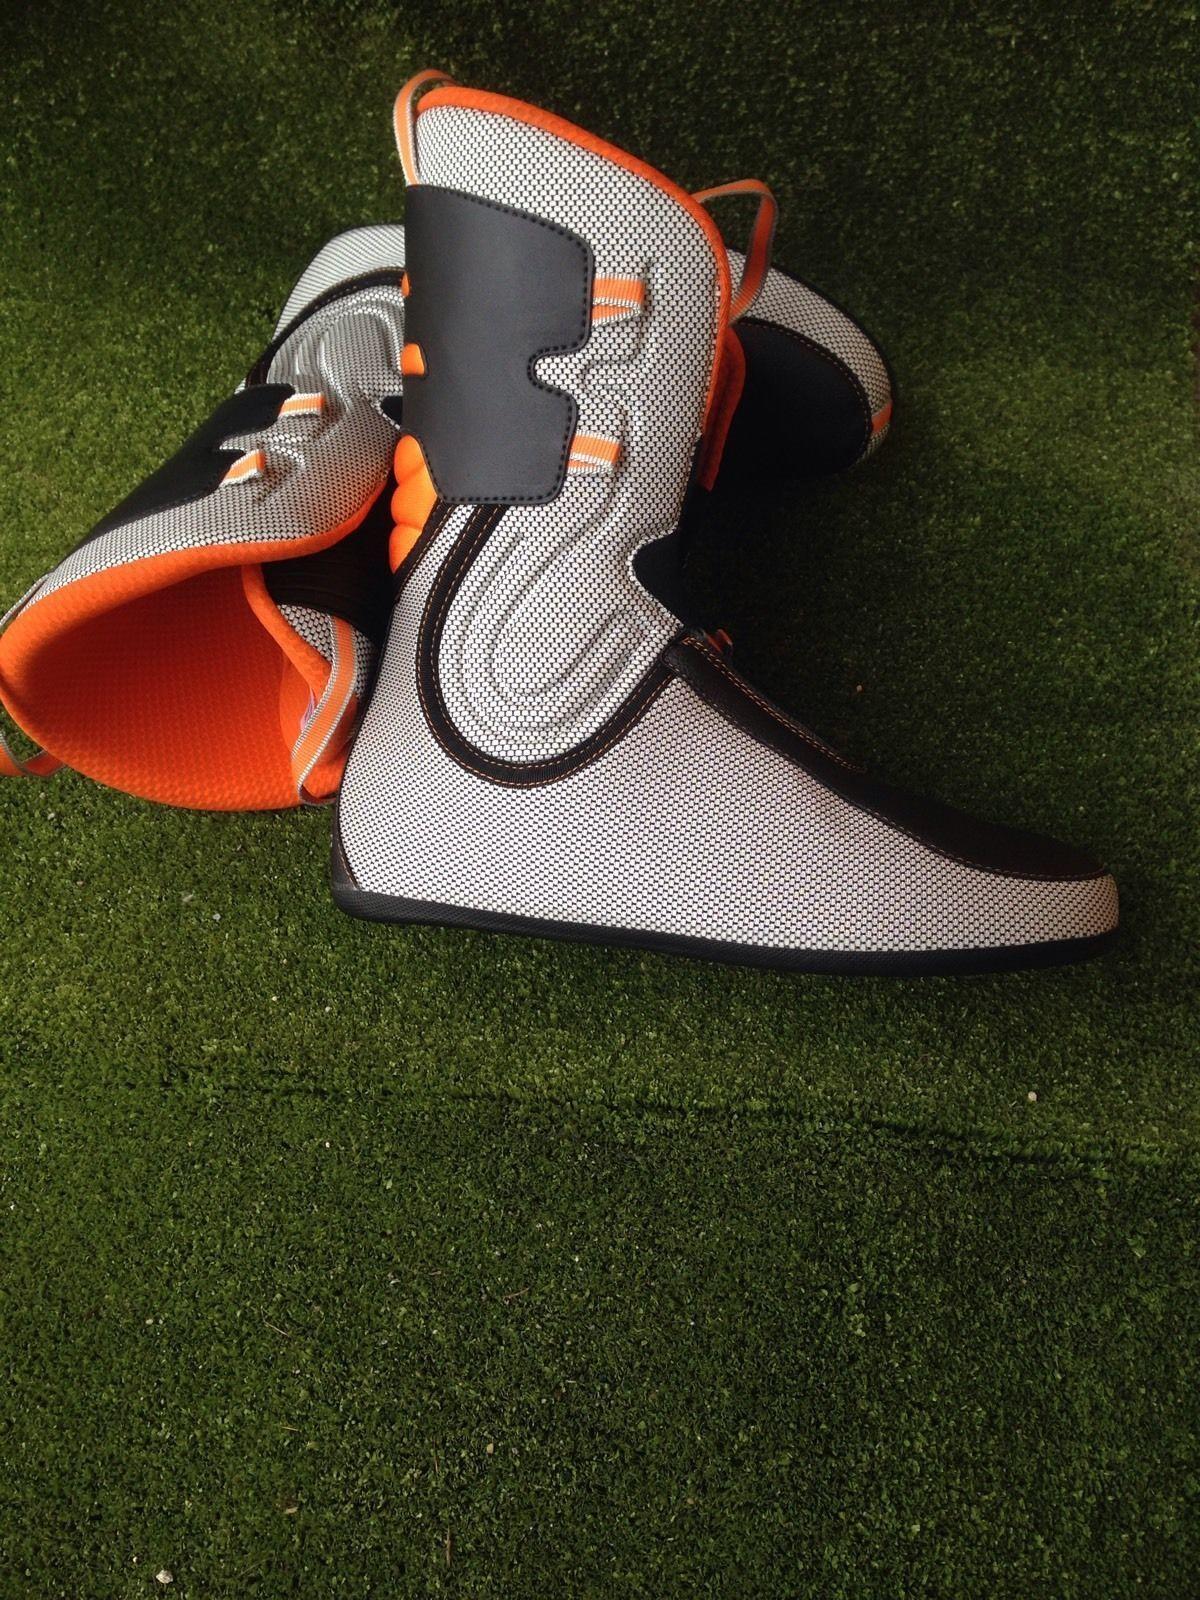 shoestte interne da scialpinismo per scarponi da sci ski alp liners inner boots